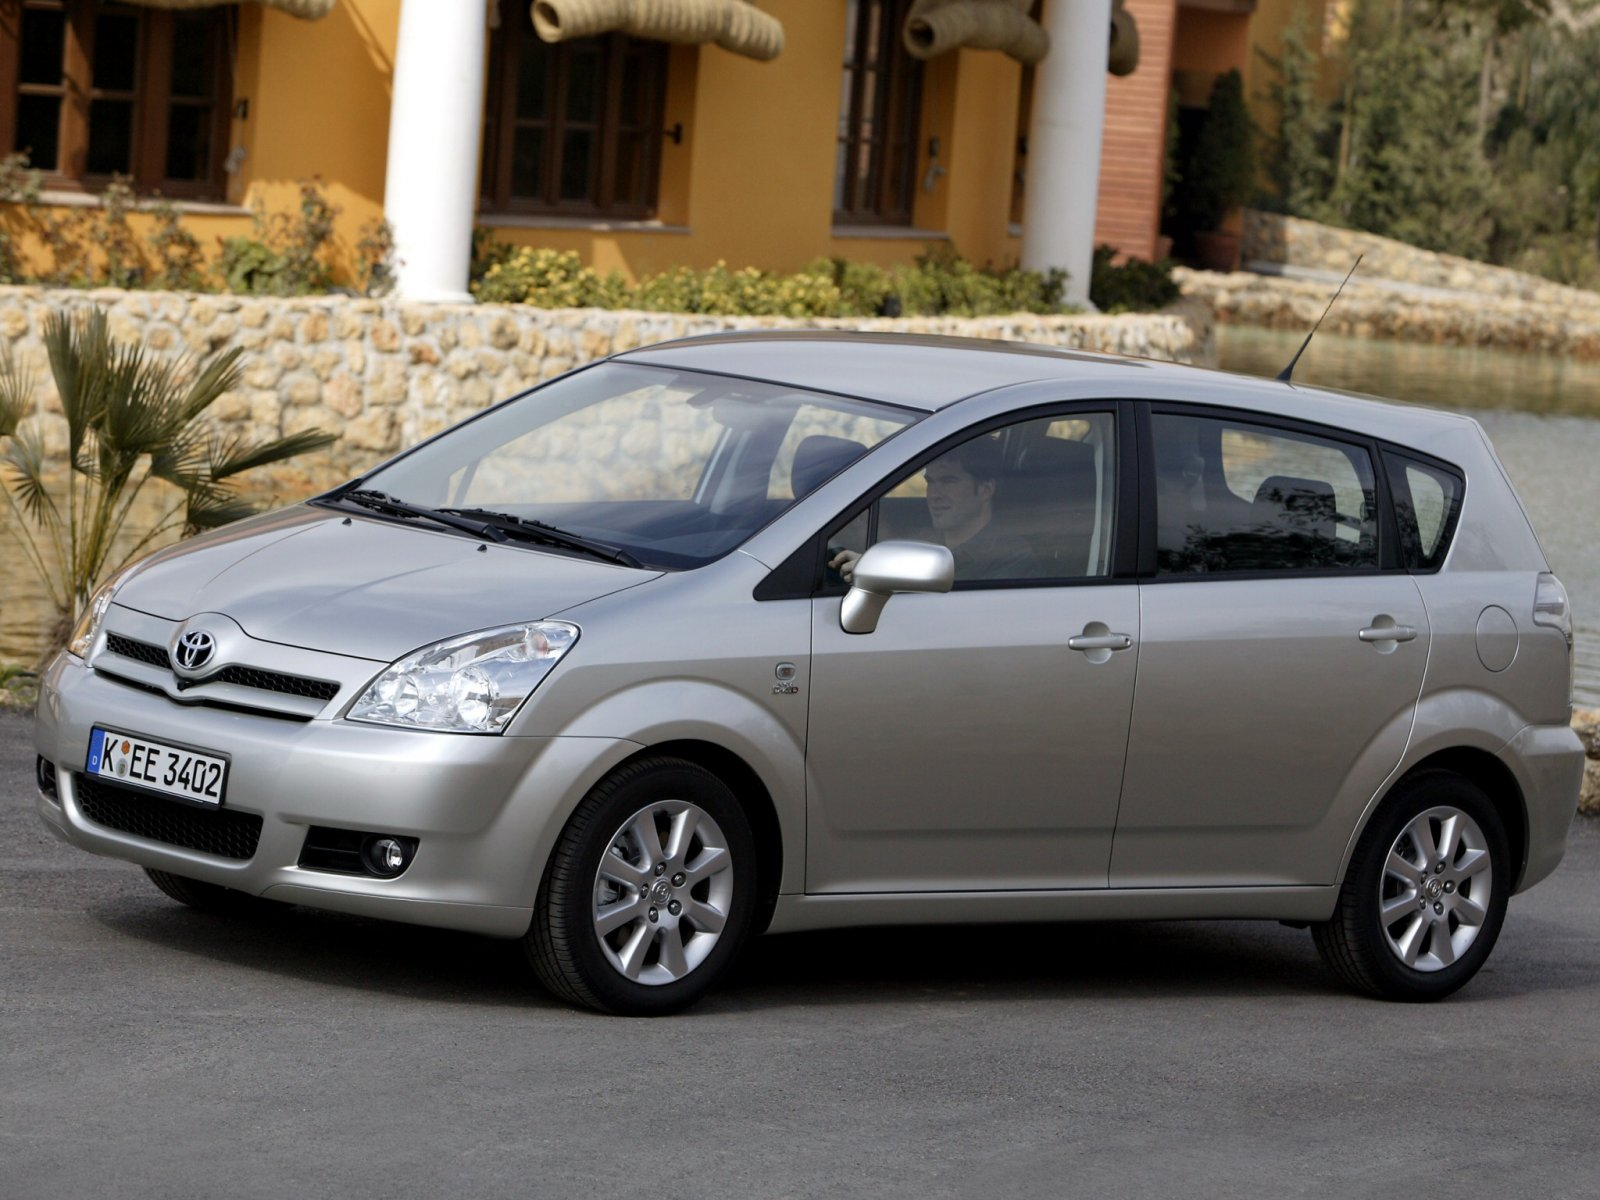 Toyota Corolla Verso 2 : essais, fiabilité, avis, photos ...